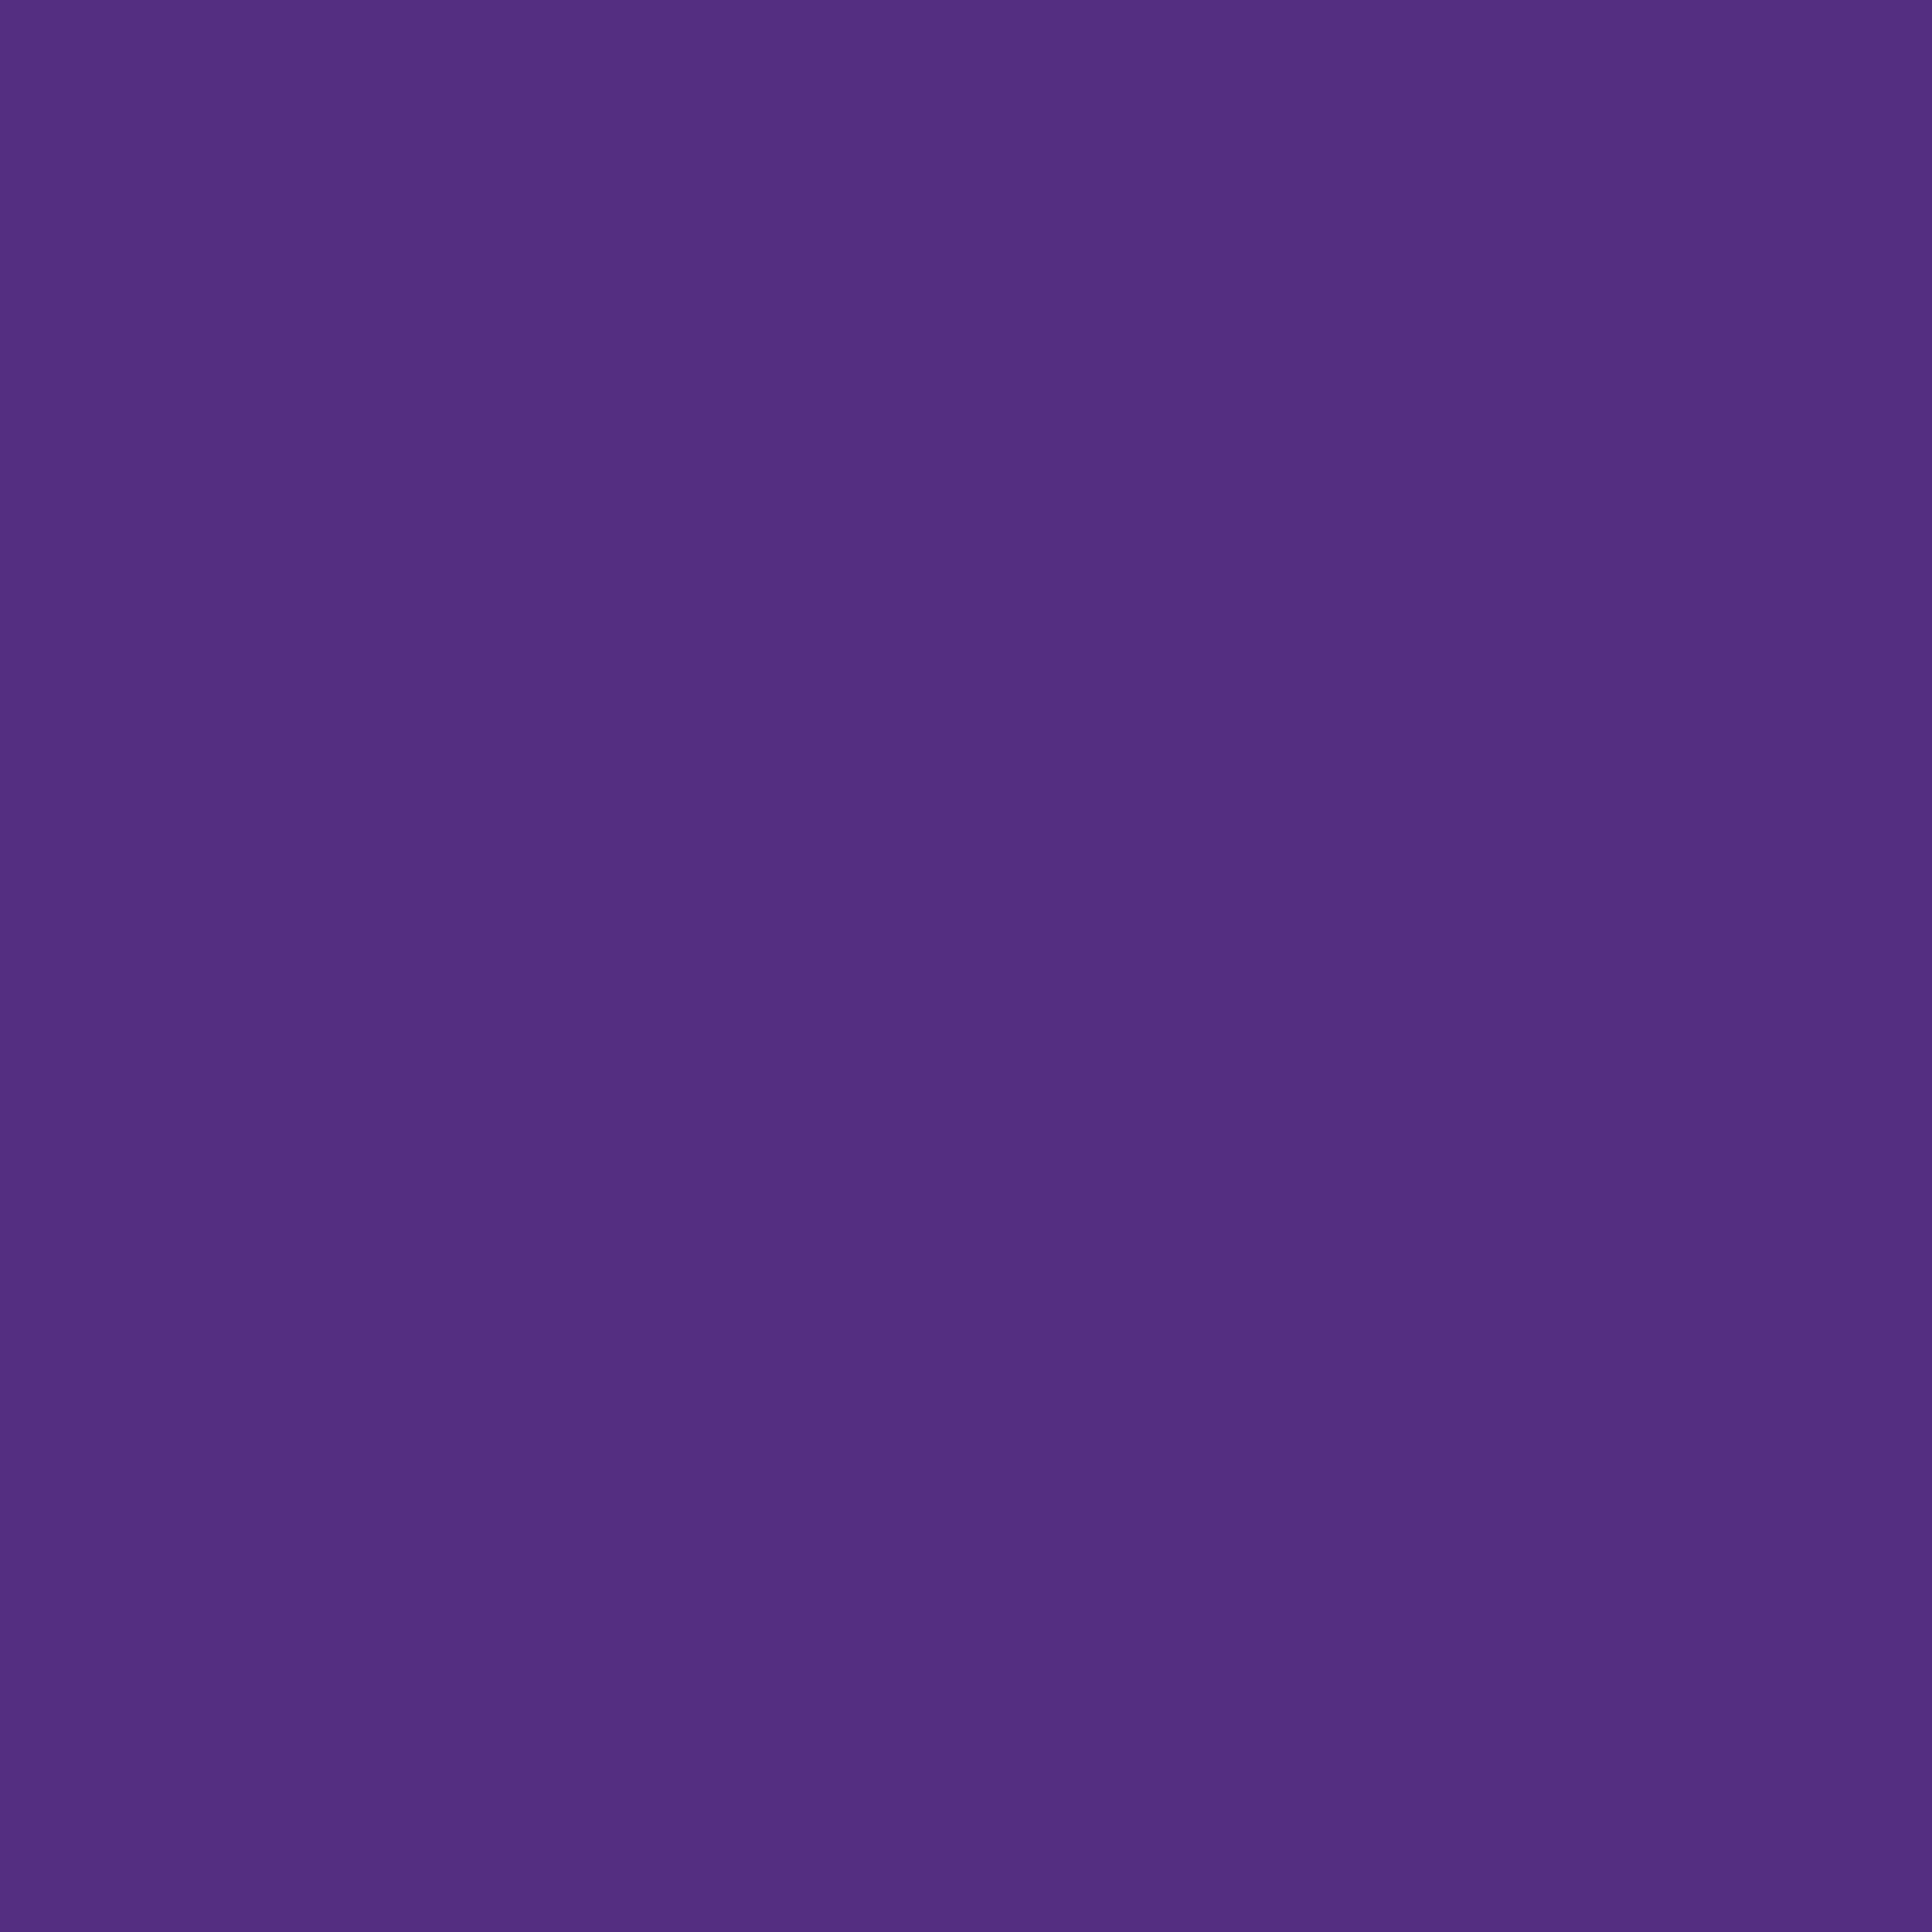 2048x2048 Regalia Solid Color Background